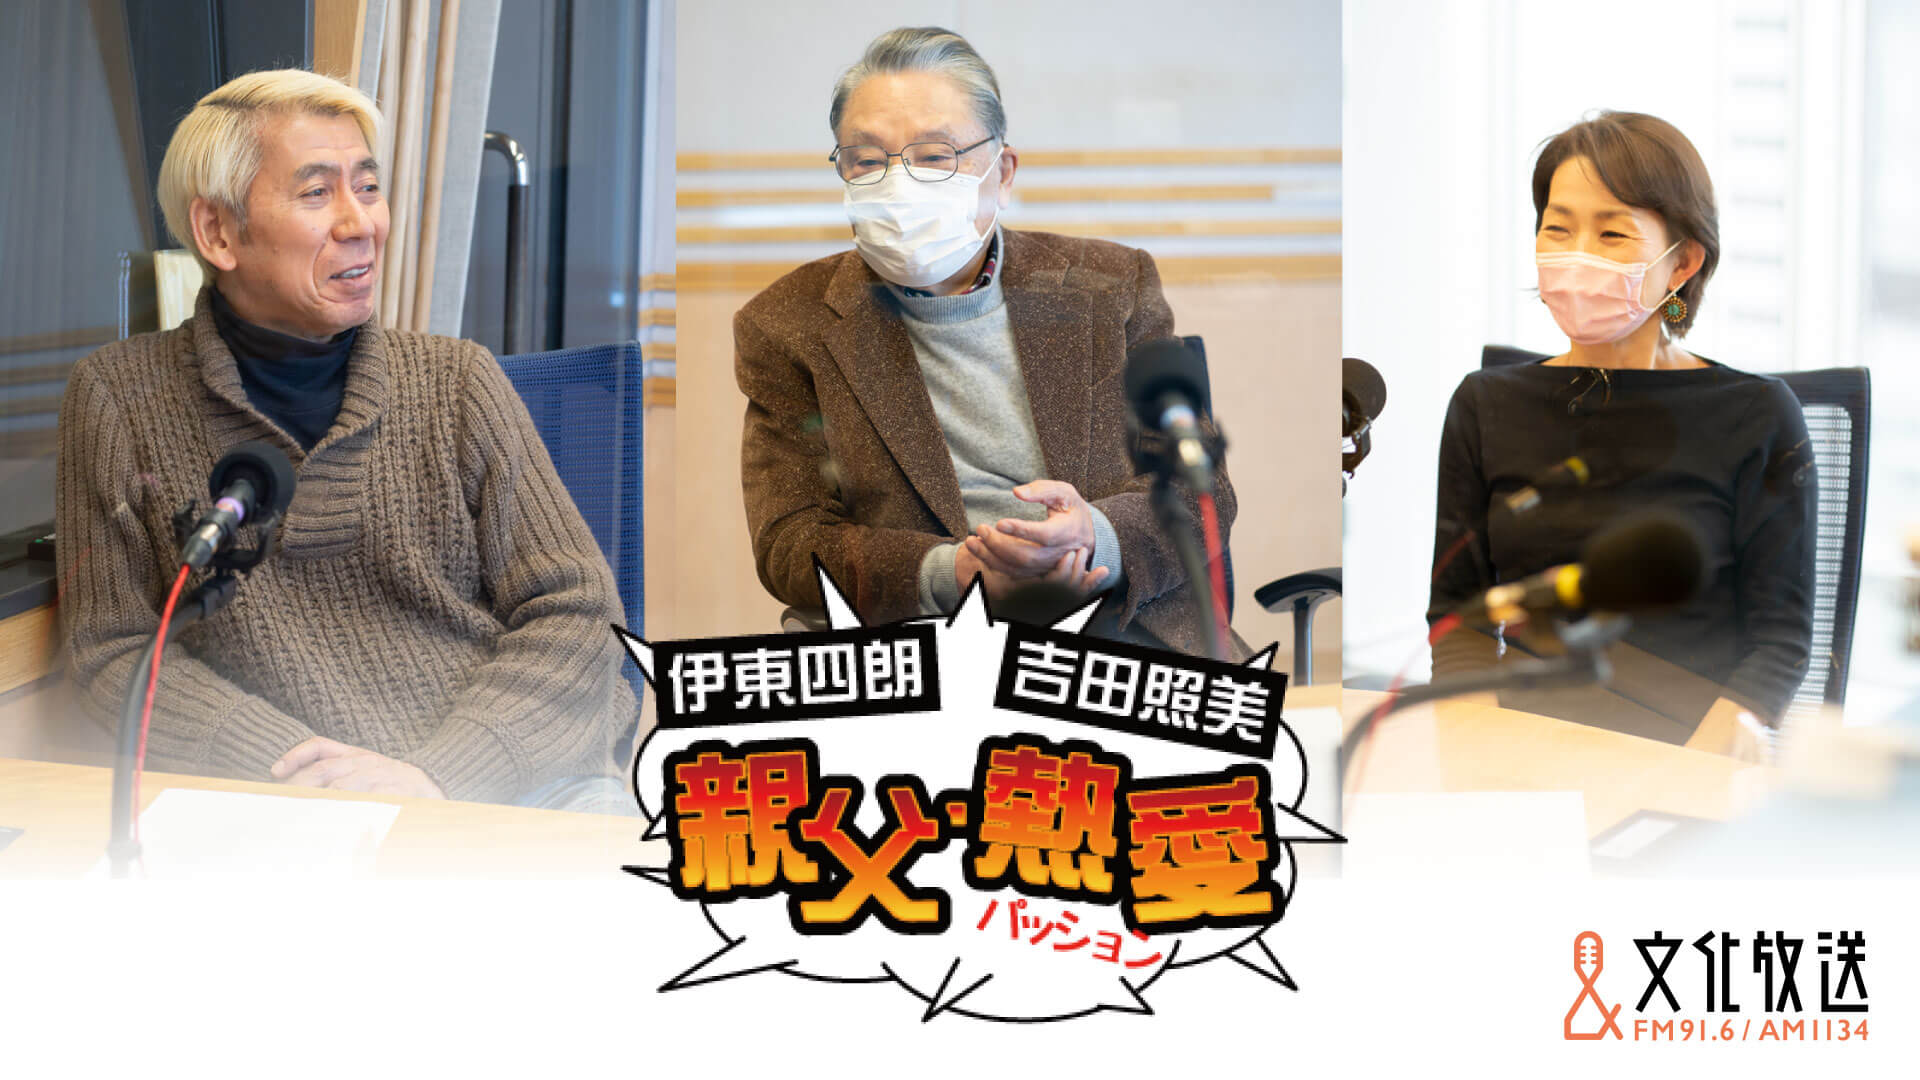 【文化放送 伊東四朗 吉田照美 親父・熱愛 パッション動画】#12